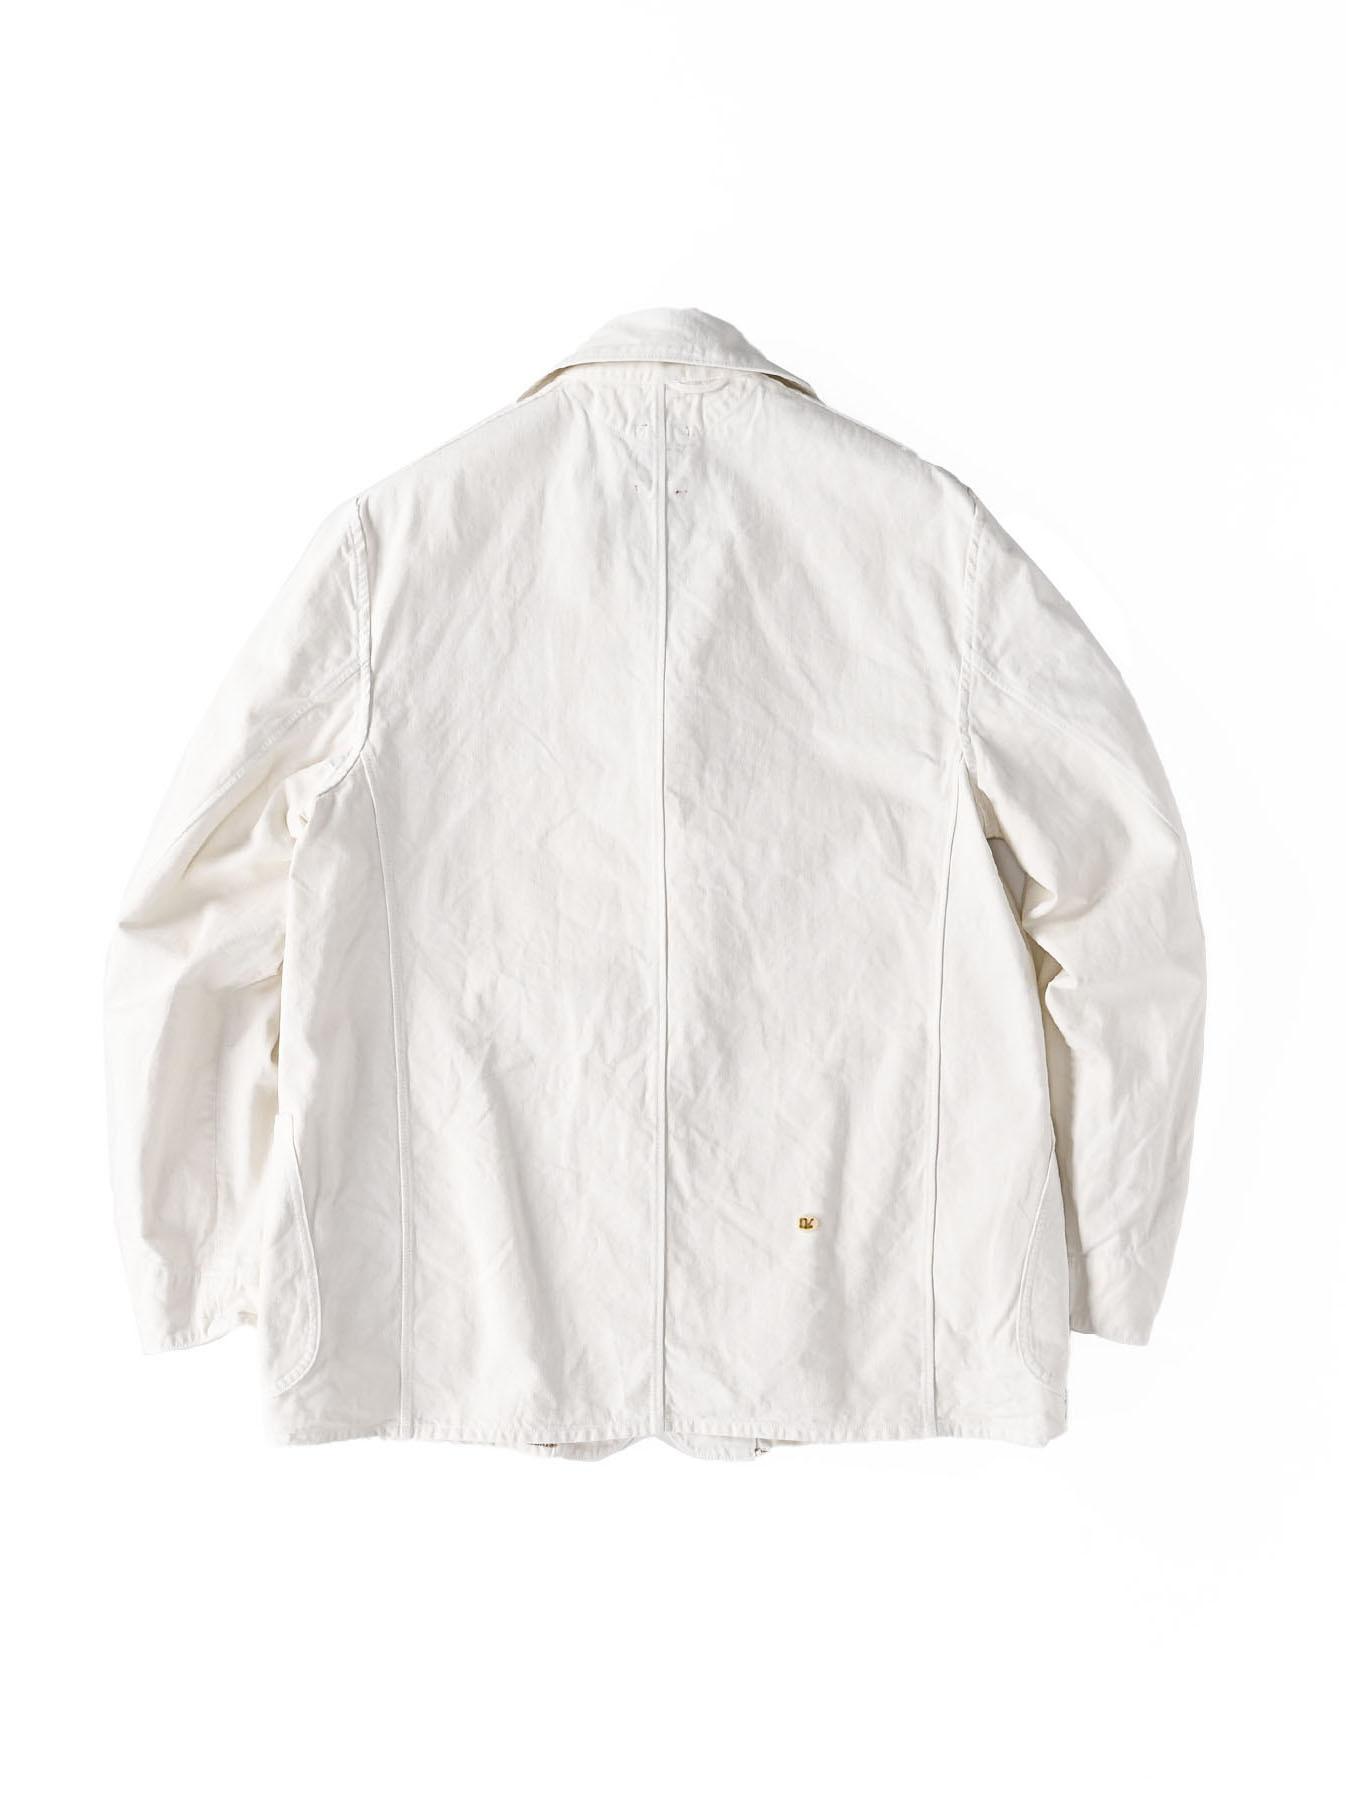 White 908 Coverall (0621)-6